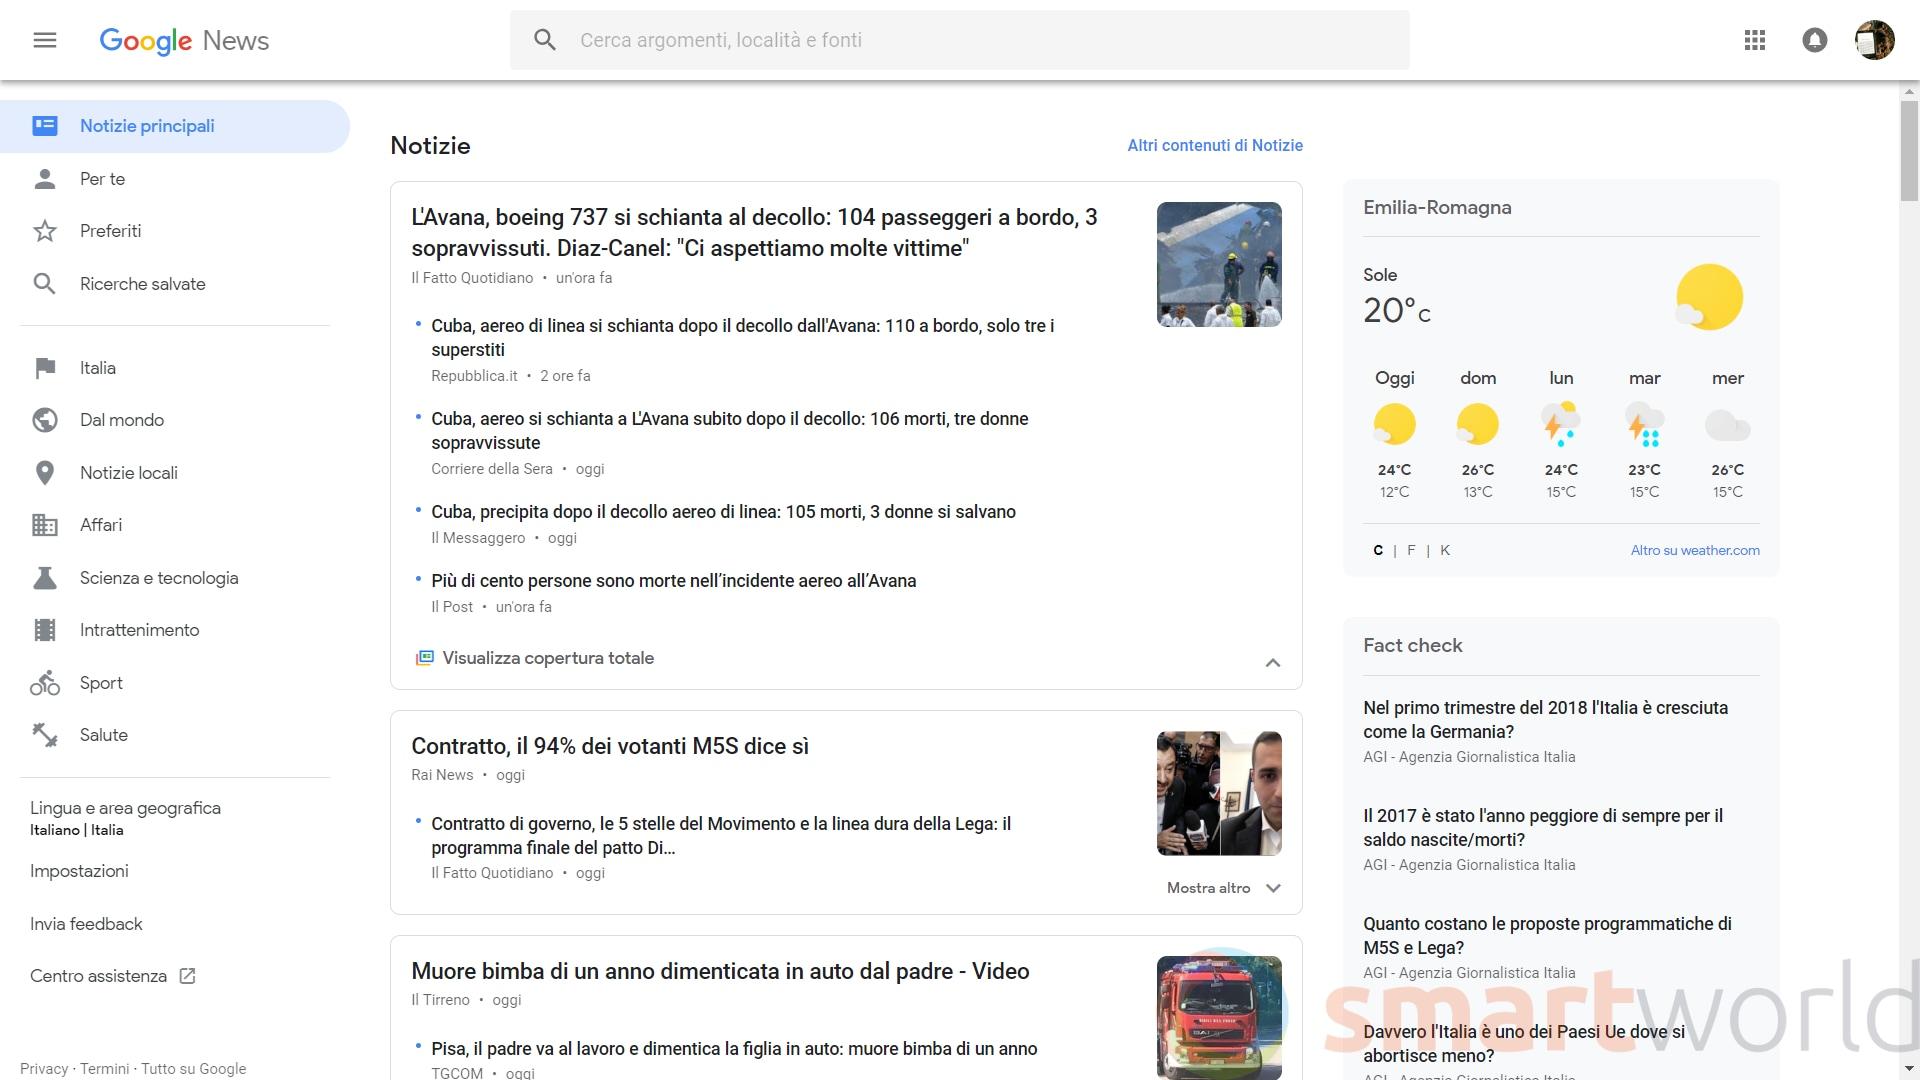 google-news-web-material-design-revisione-06